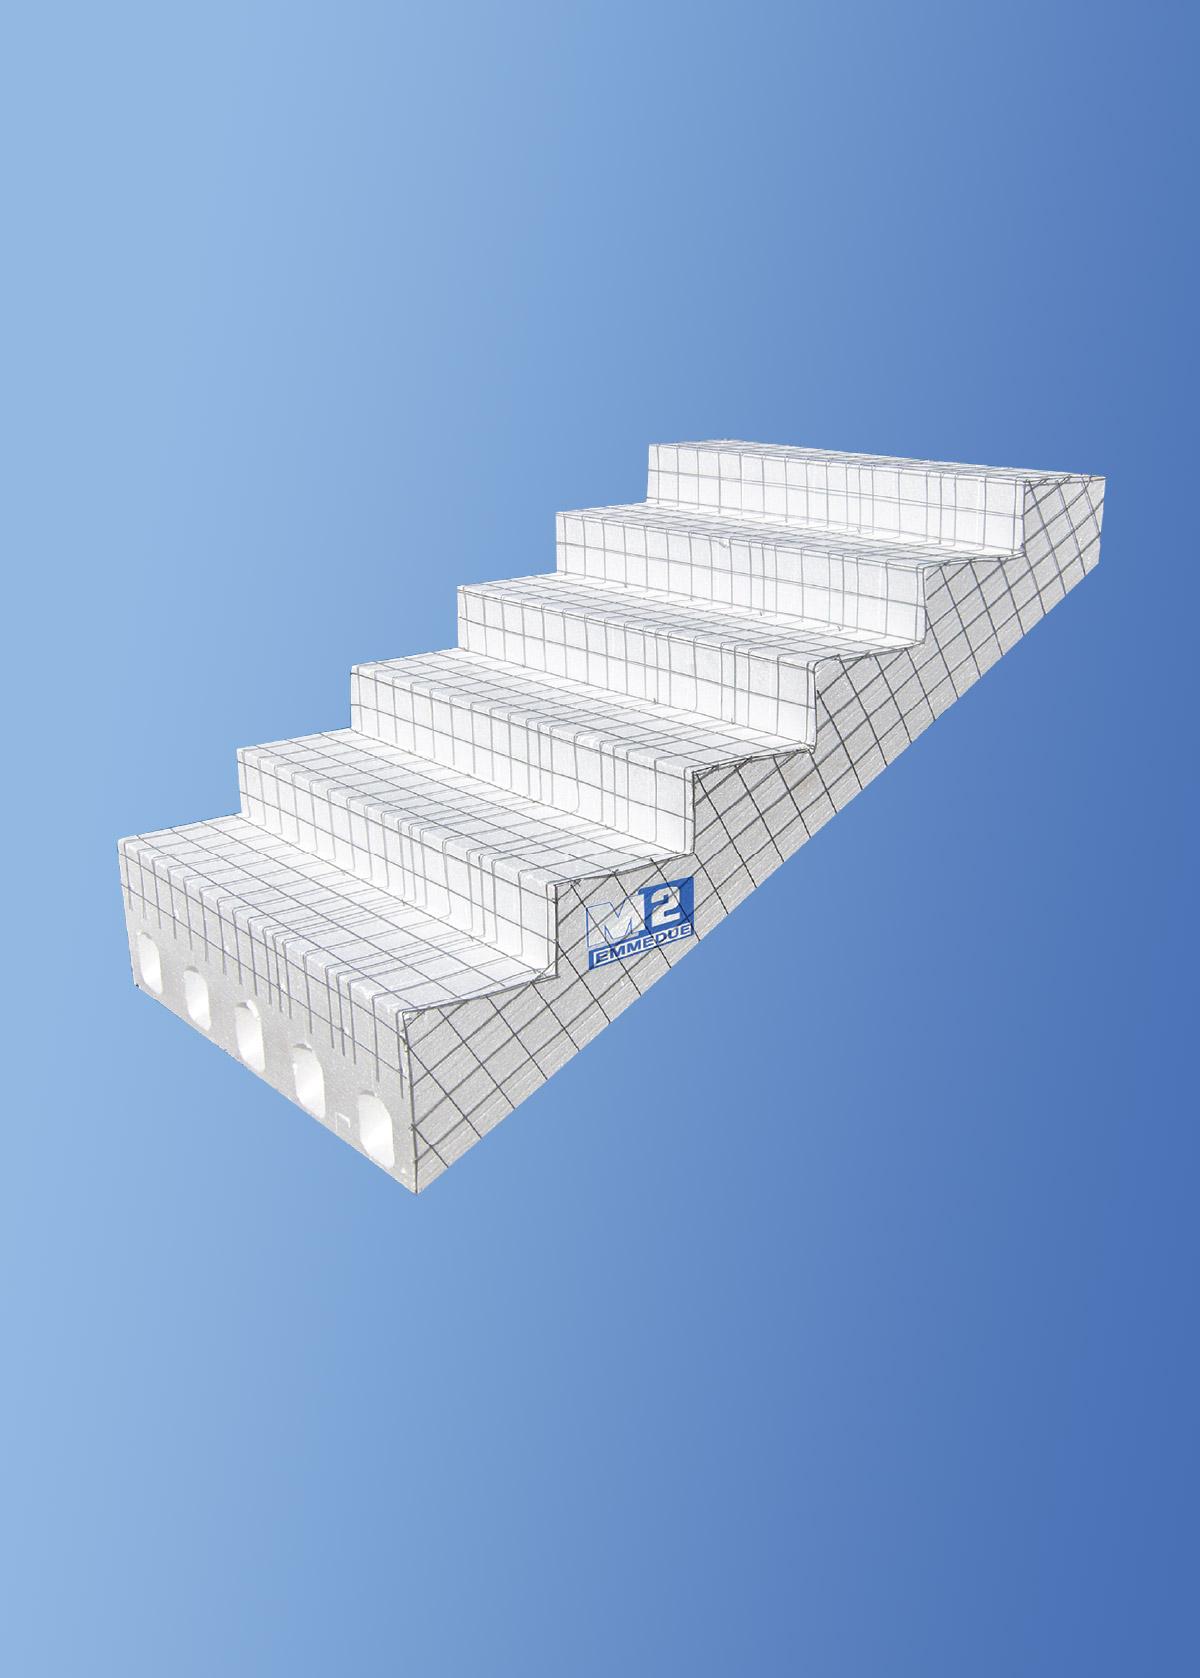 emmedue-nicaragua-panelconsa-panel-escalera